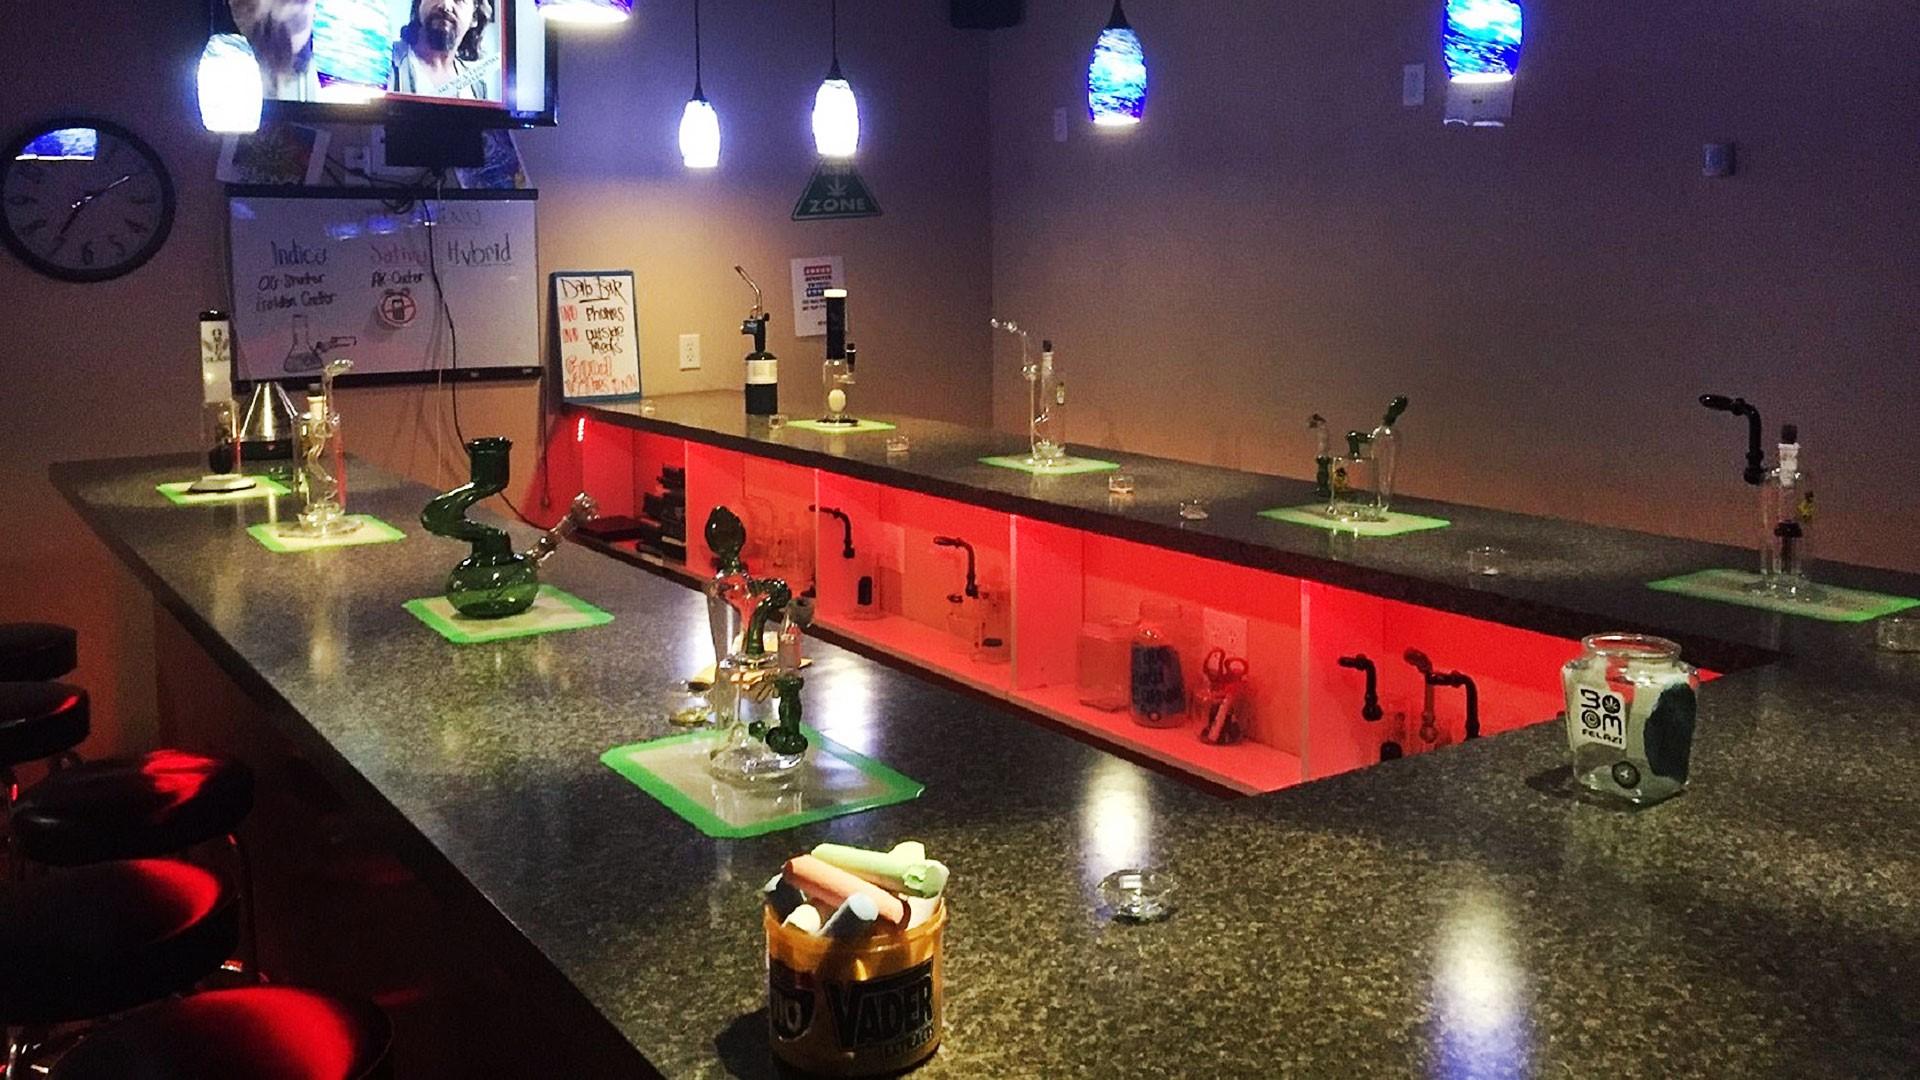 CaptainJacks dab bar and medical marijuana dispensary in Upland, California